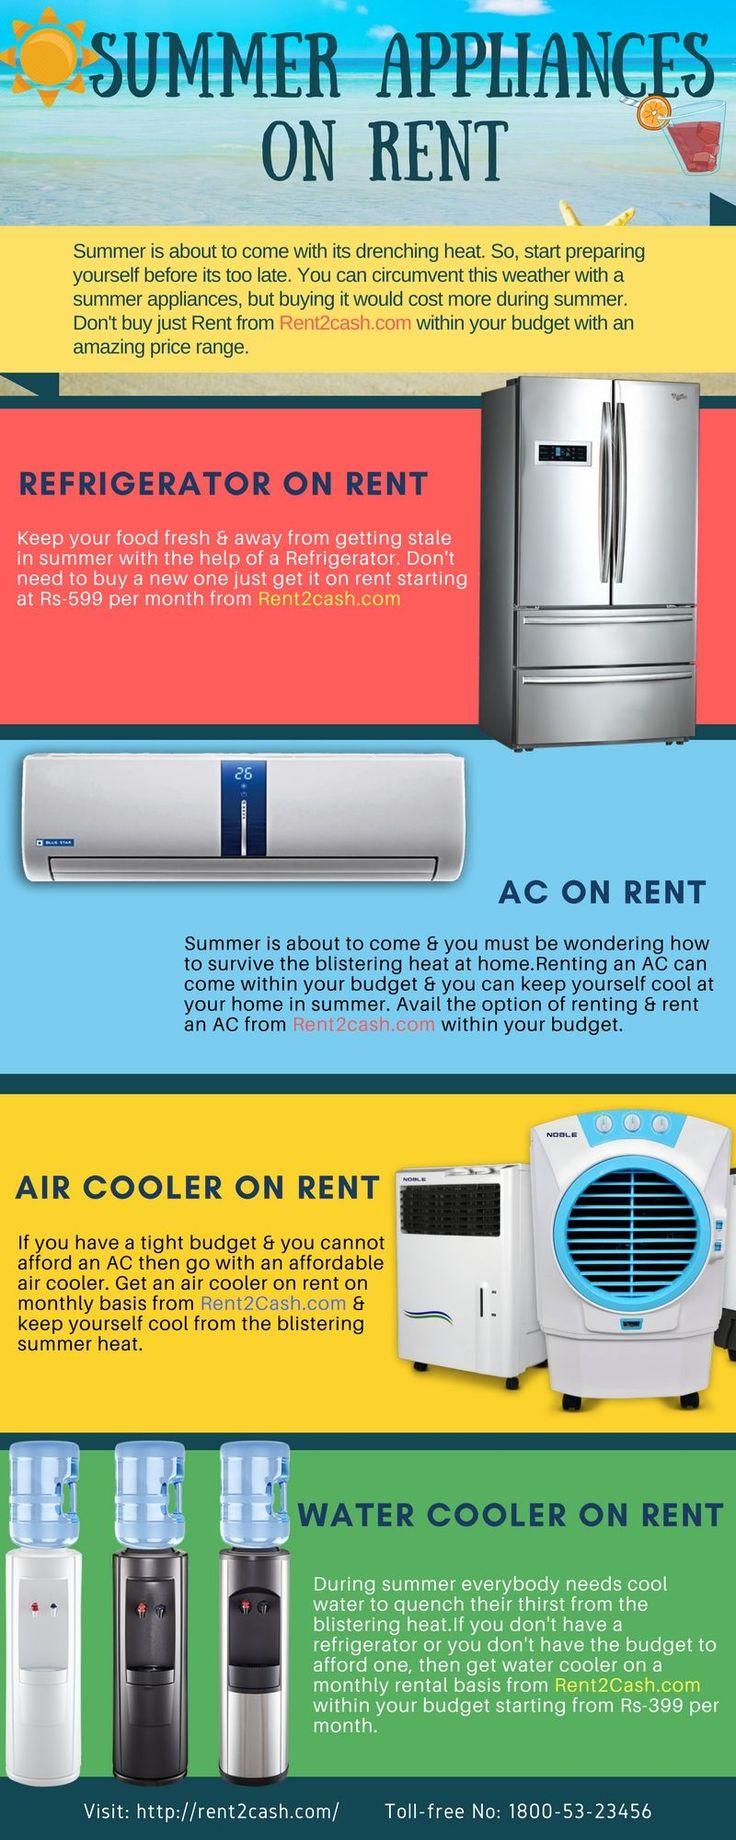 25 best Home Appliances on Rent images on Pinterest | Appliances ...